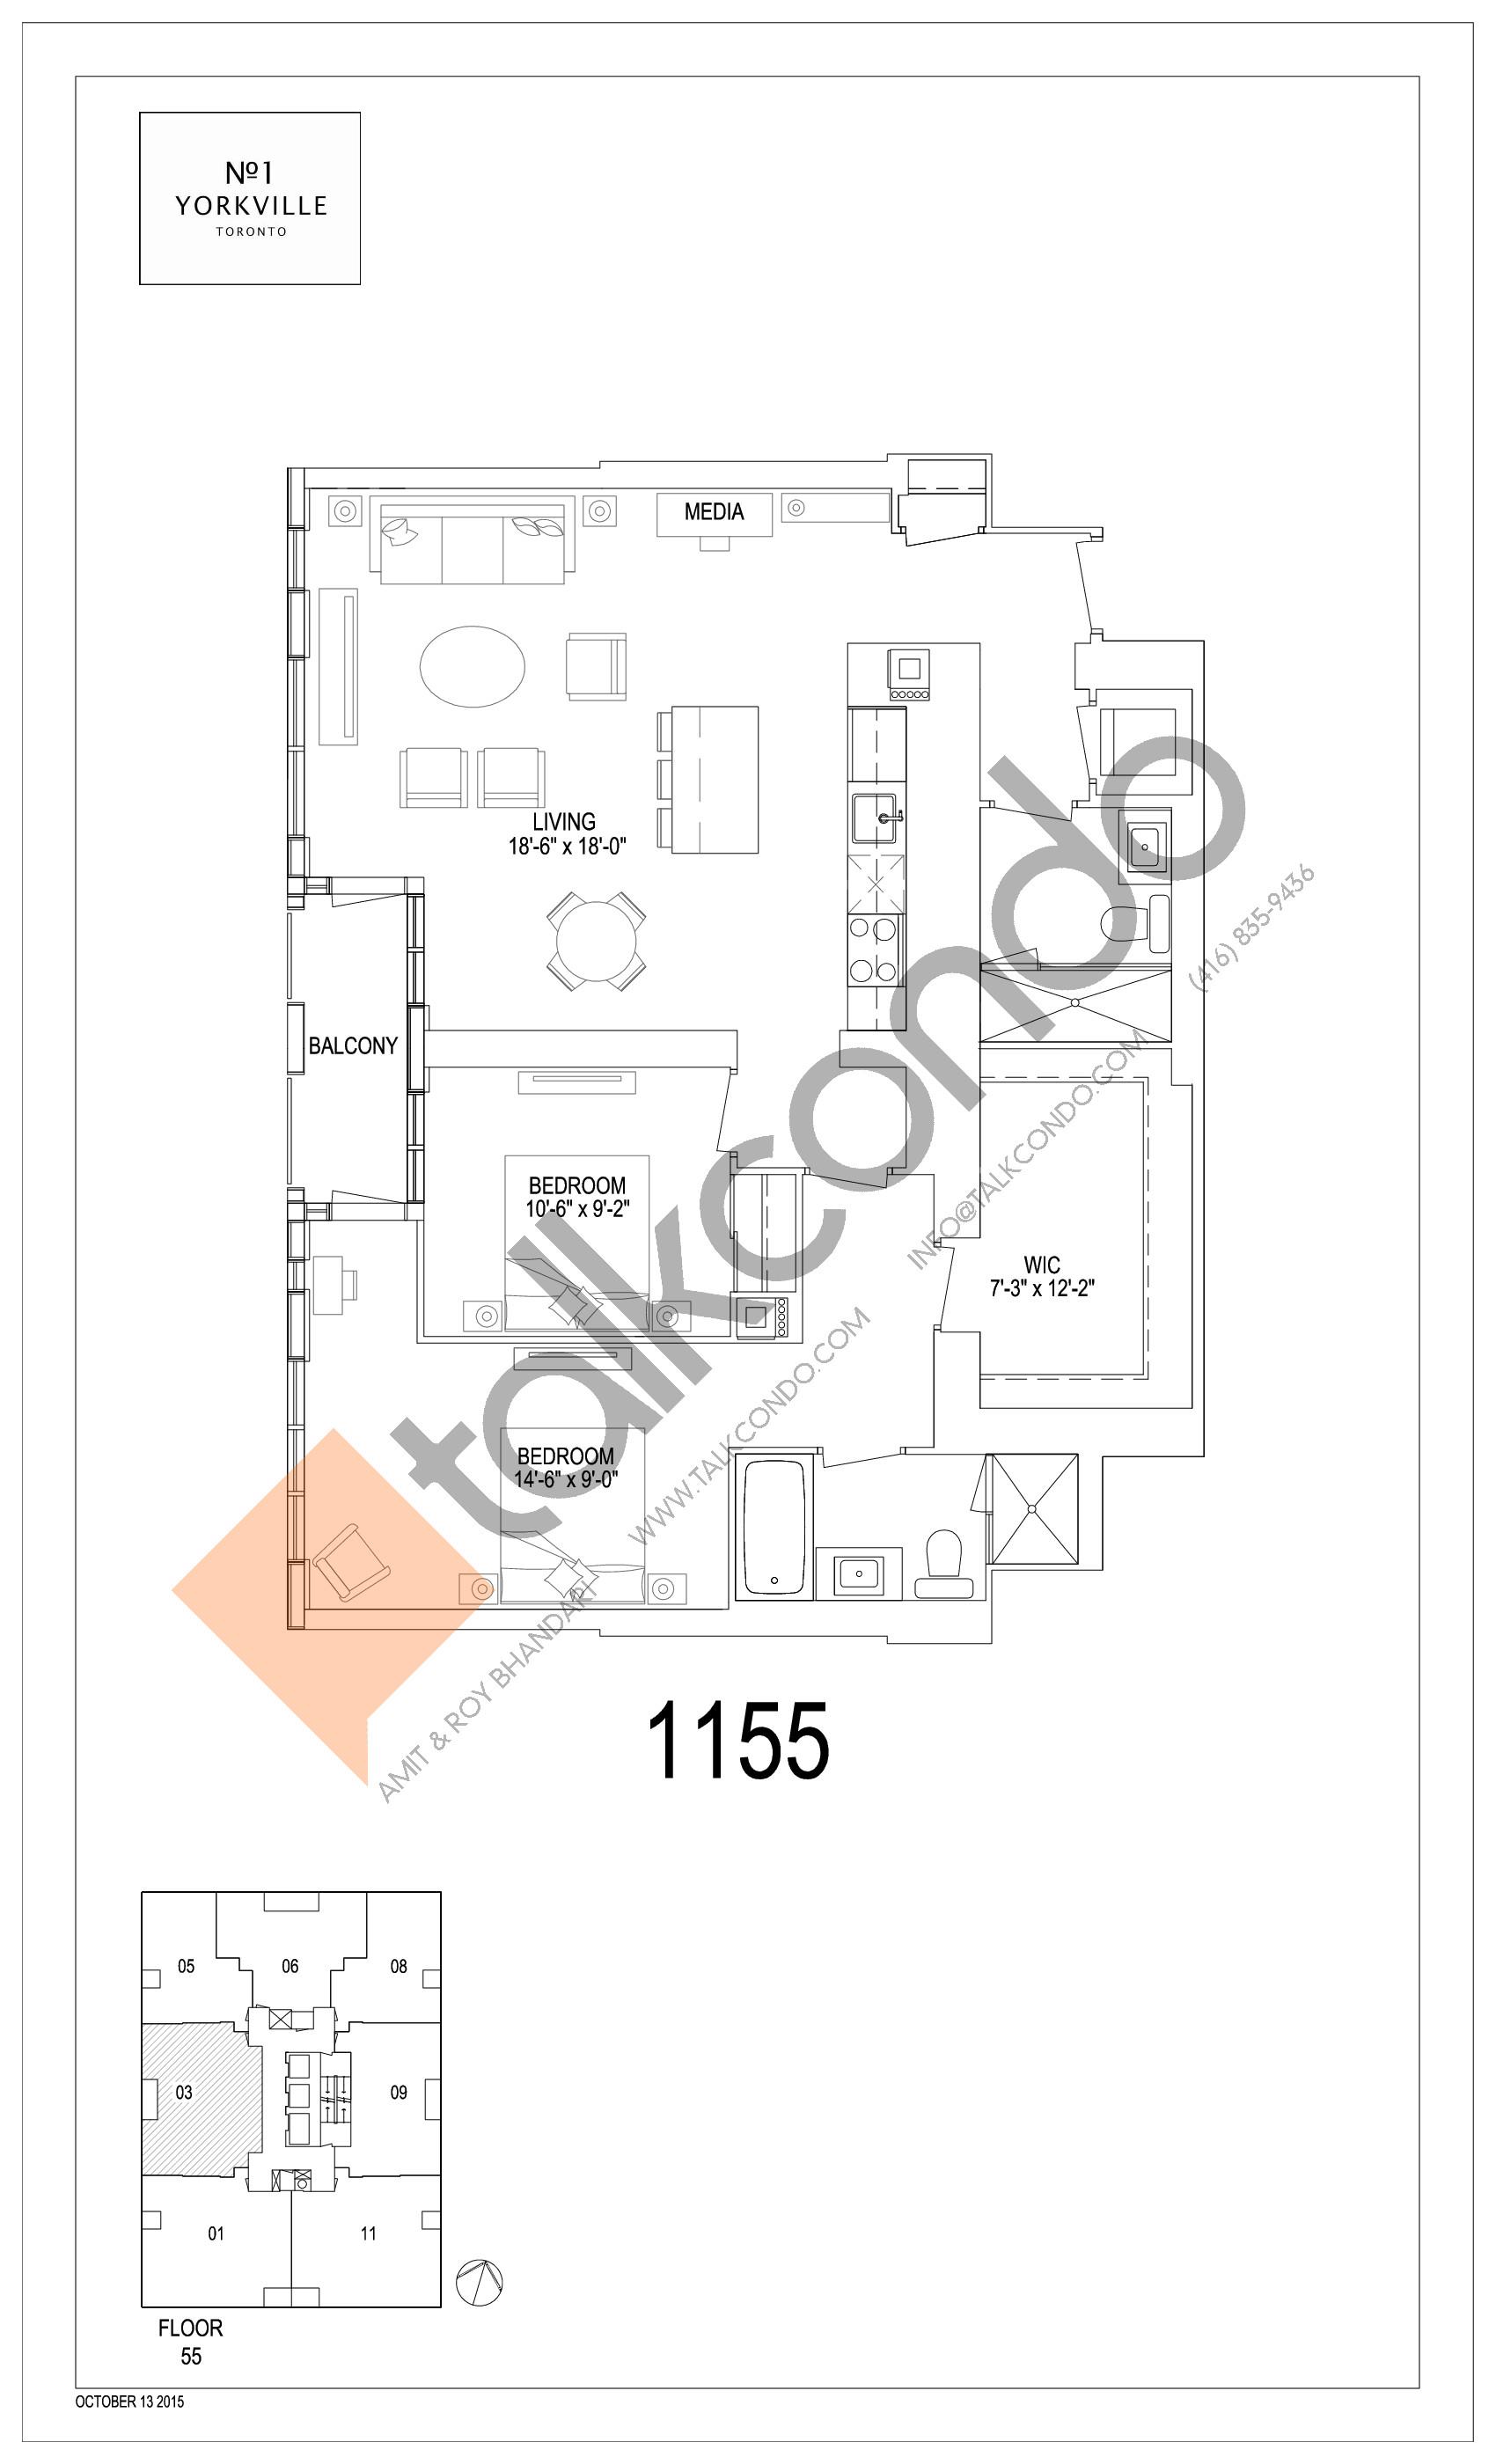 1155 Floor Plan at 1 Yorkville Condos - 1155 sq.ft